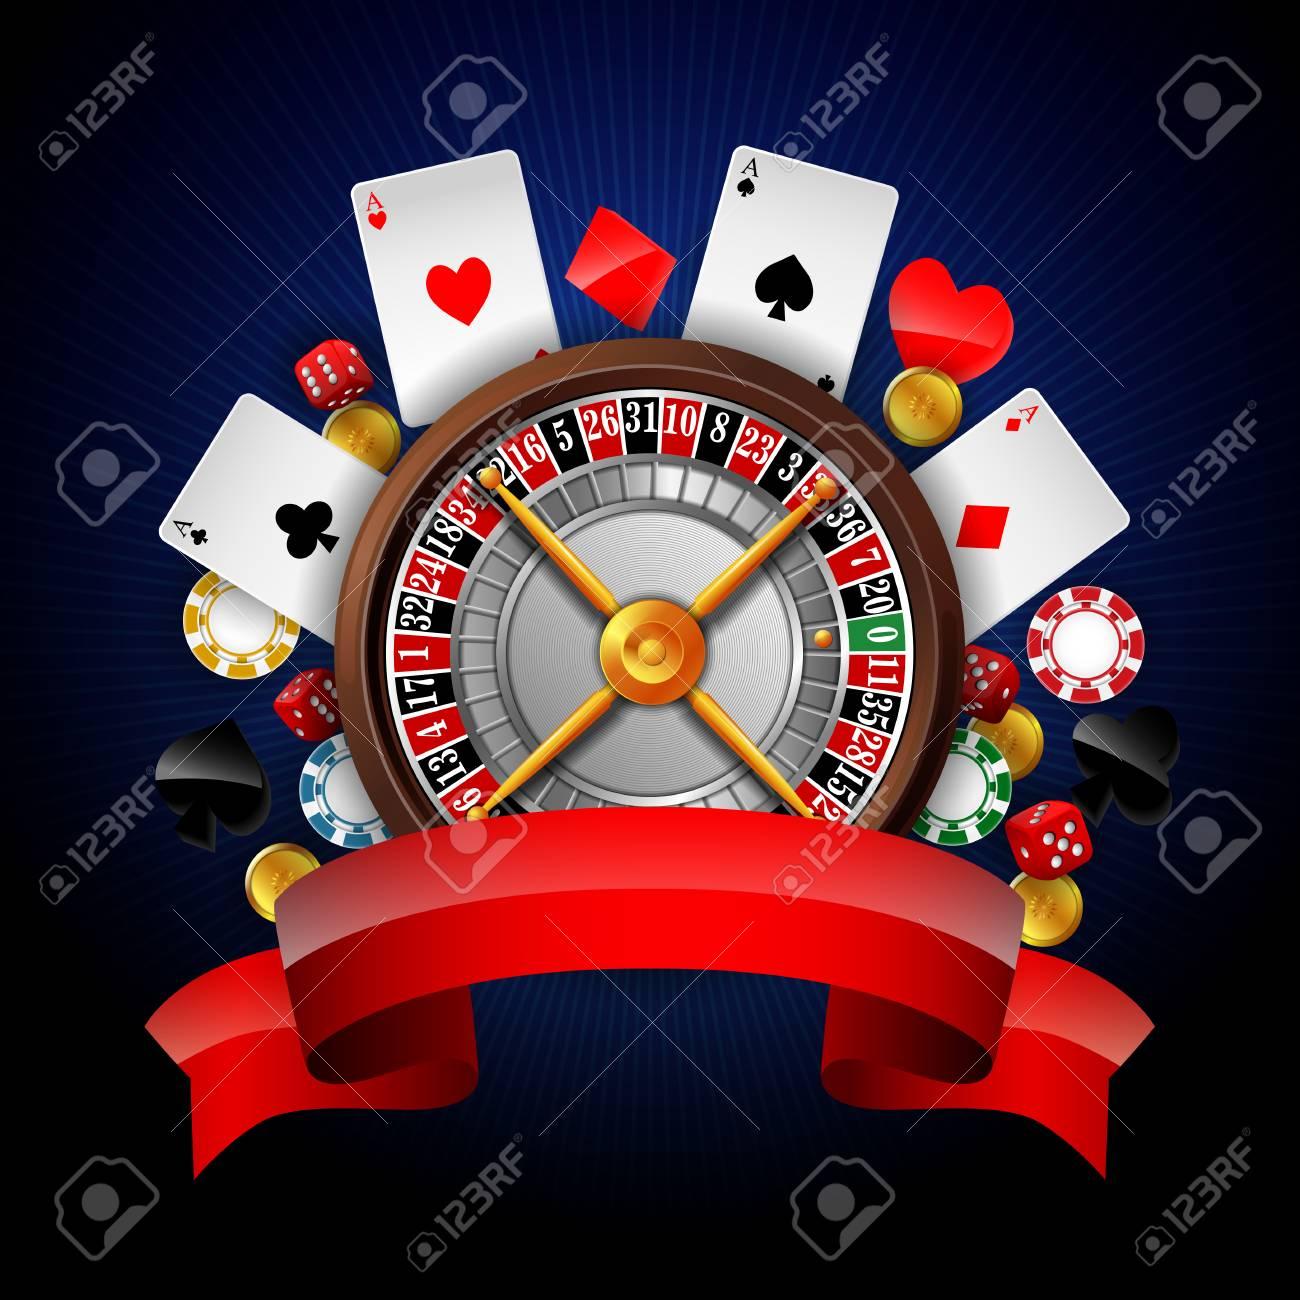 British columbia gambling age